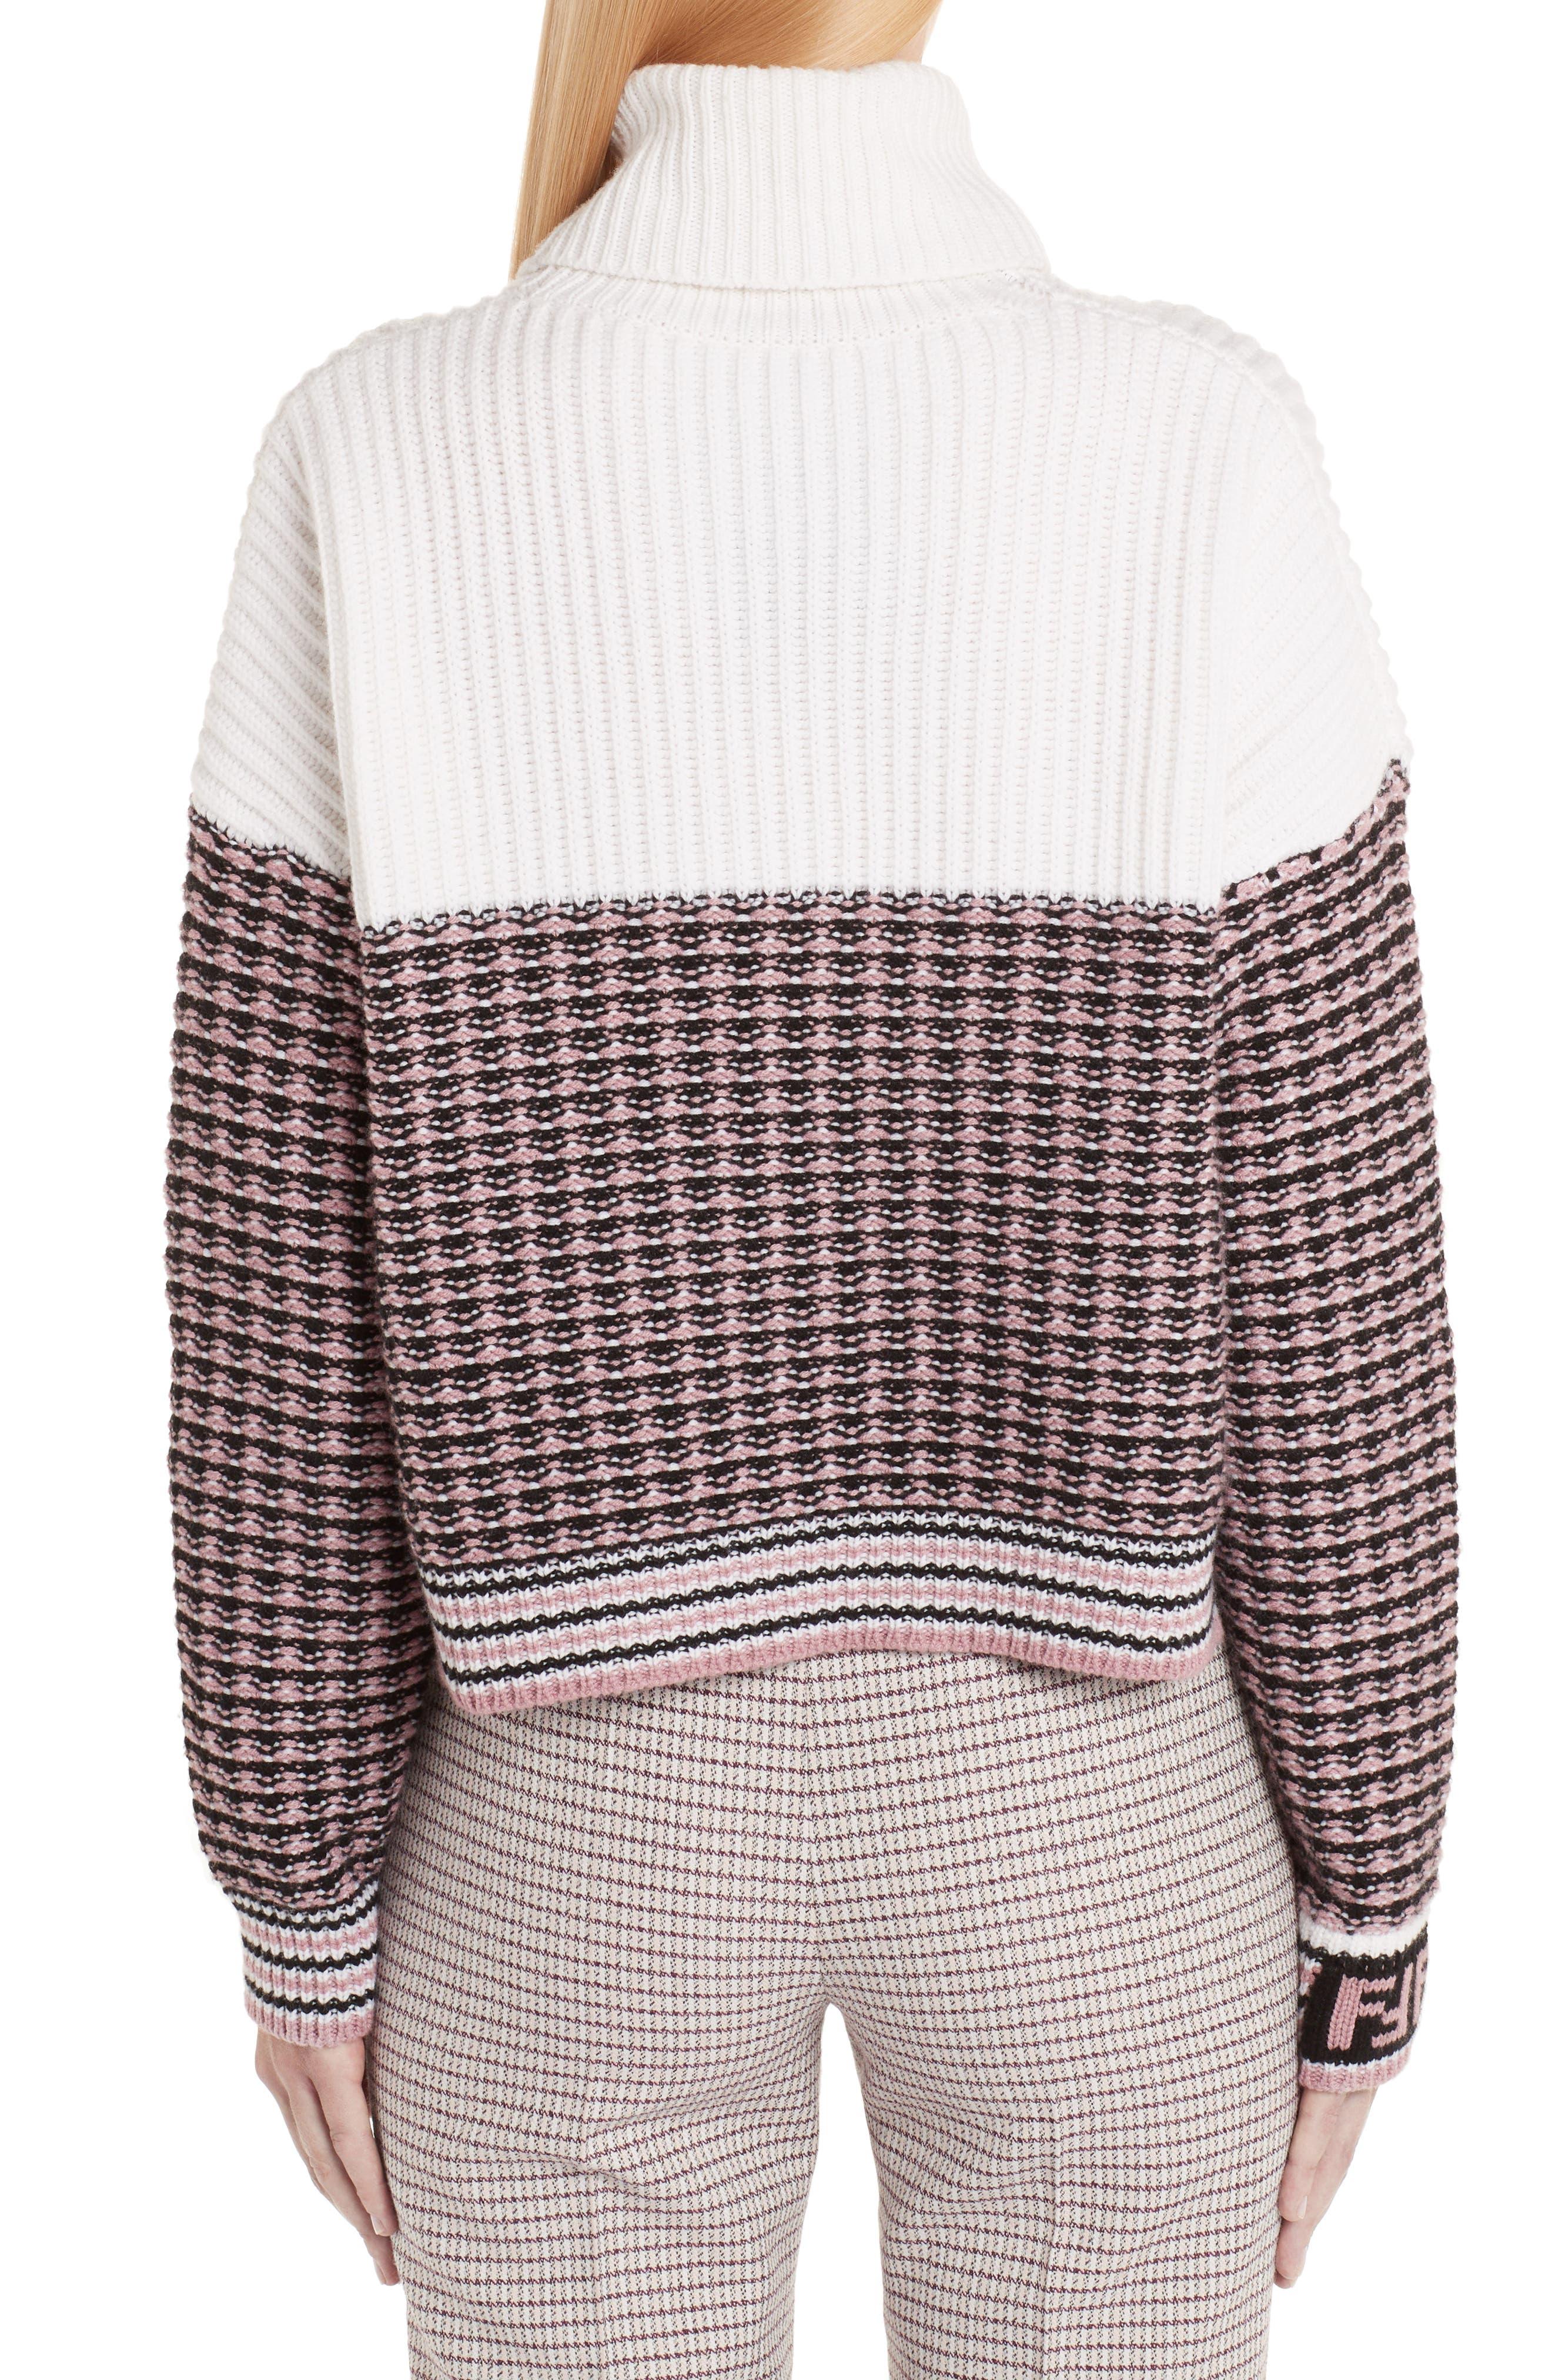 Microcheck Wool & Cashmere Sweater,                             Alternate thumbnail 2, color,                             ARUBA PINK